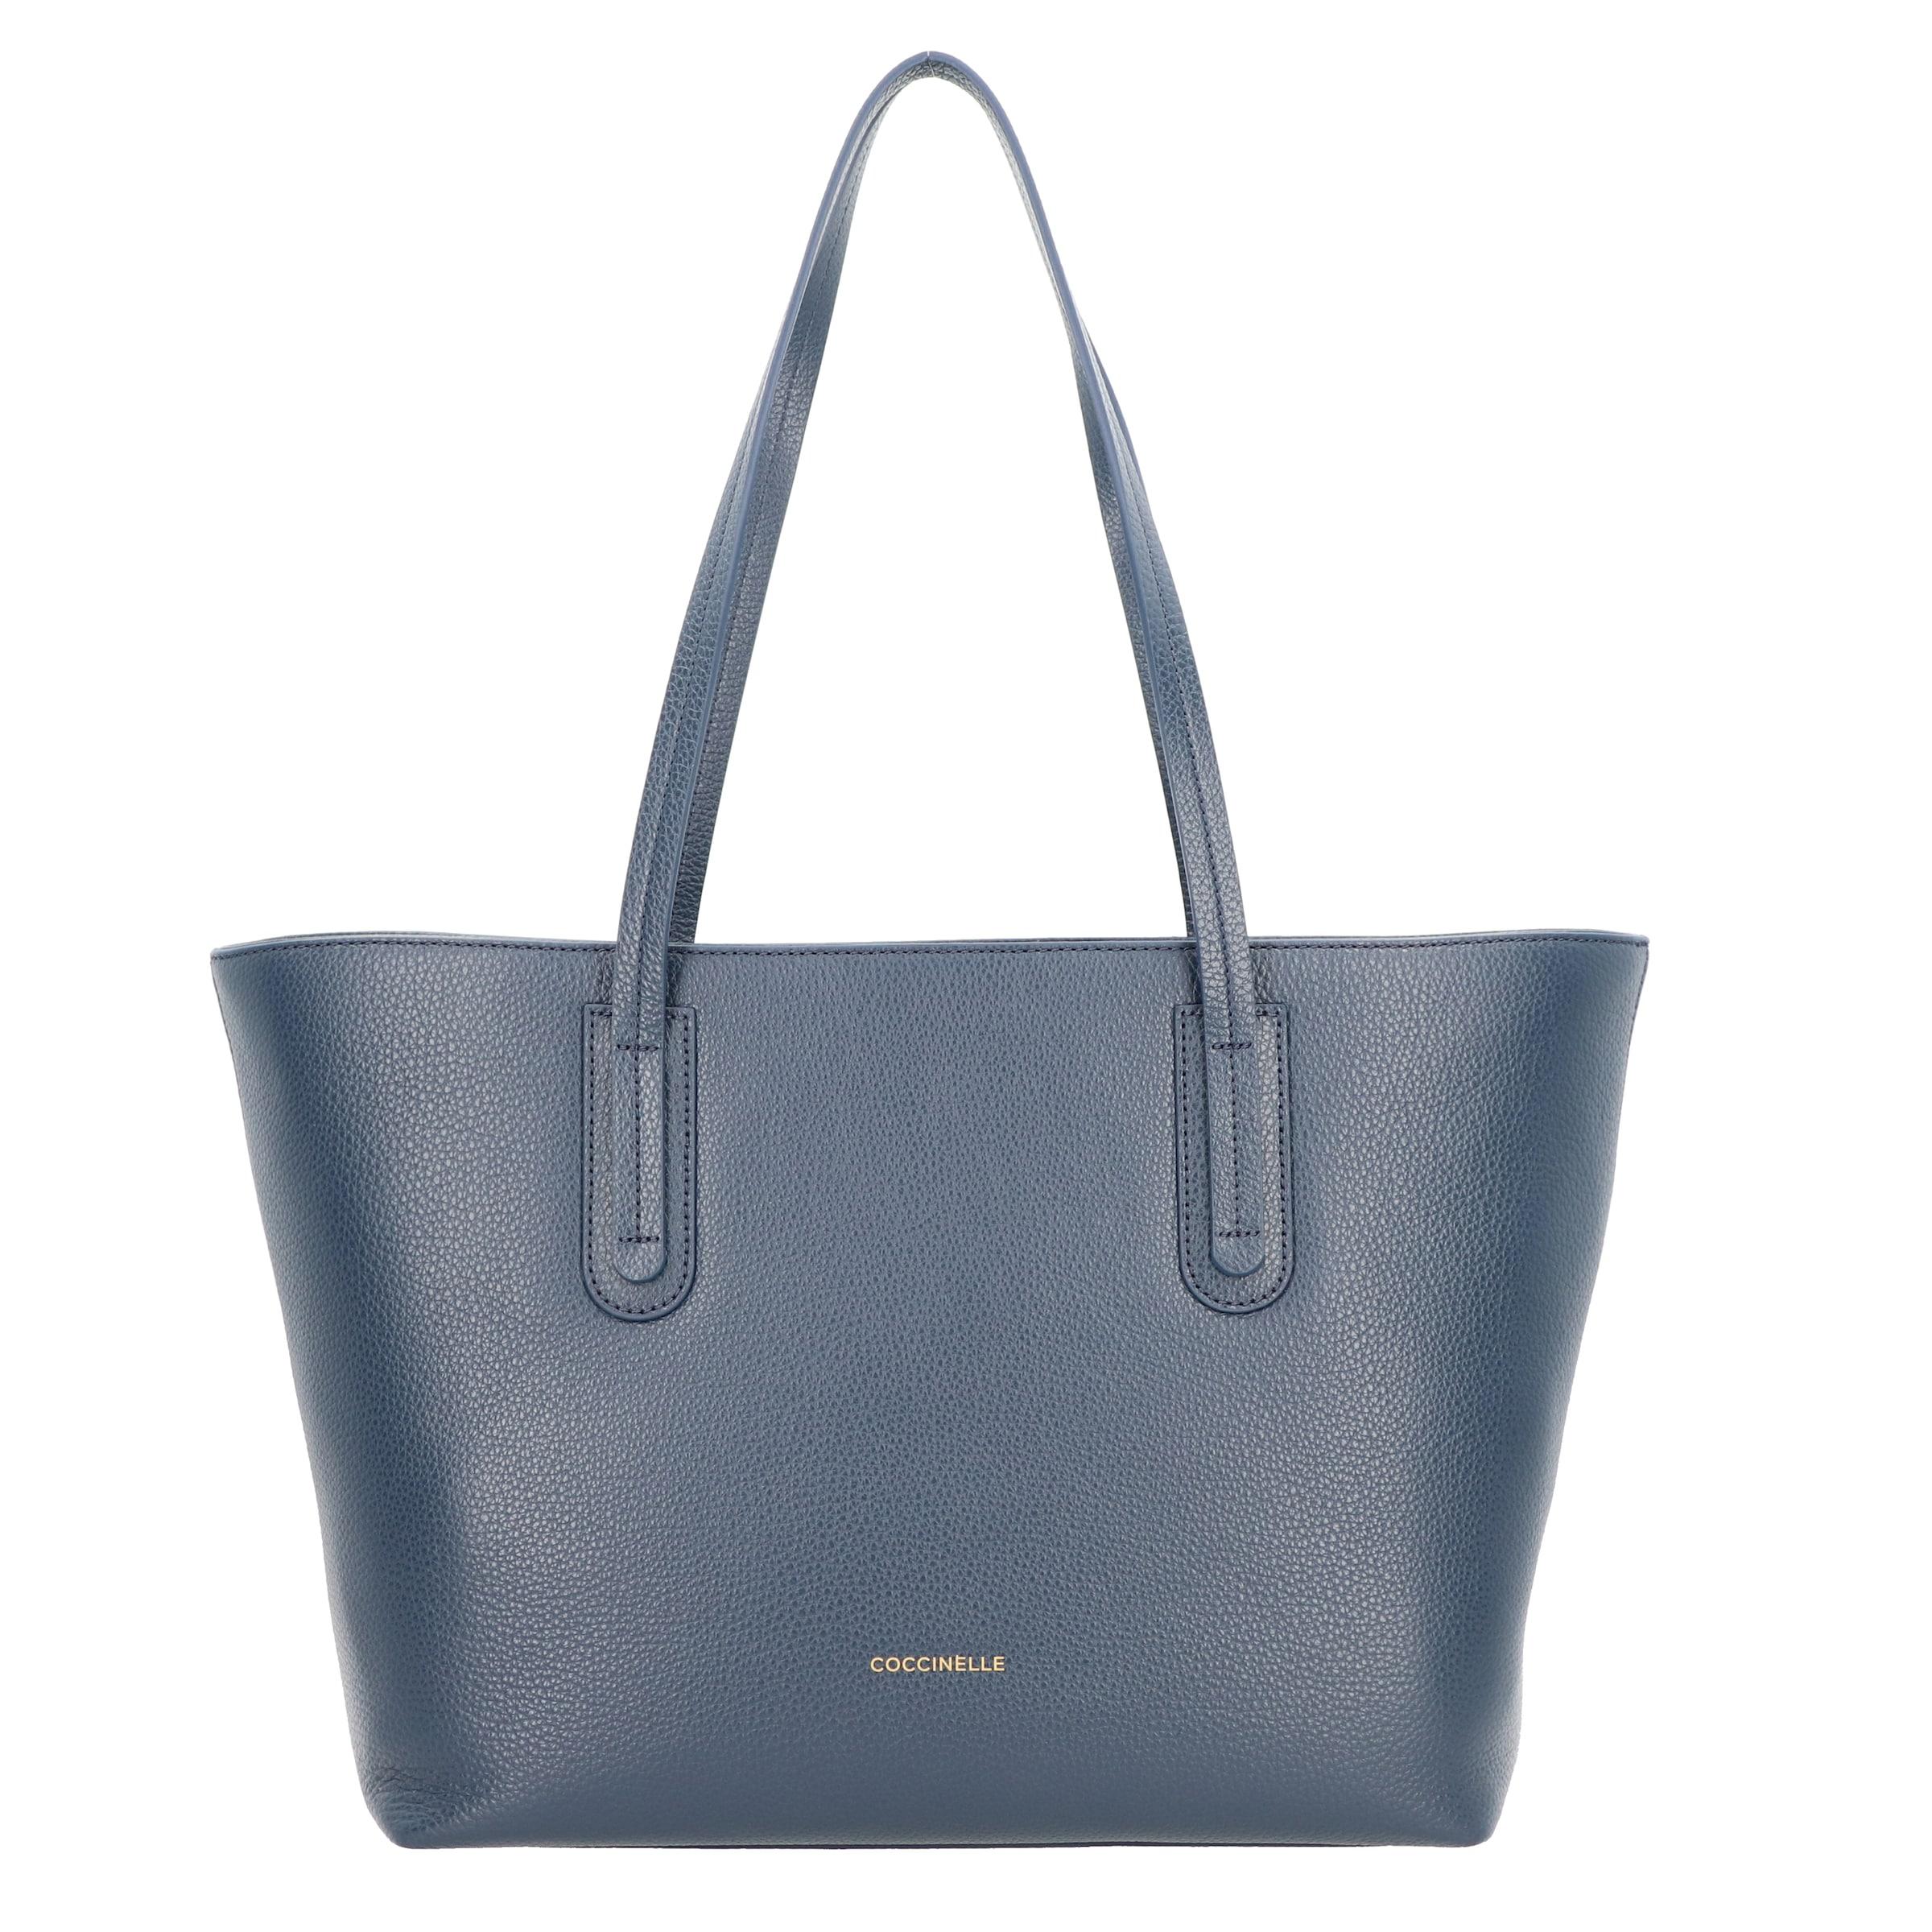 Blau Cm Shopper 32 In 'dione' Coccinelle tsrhCQd